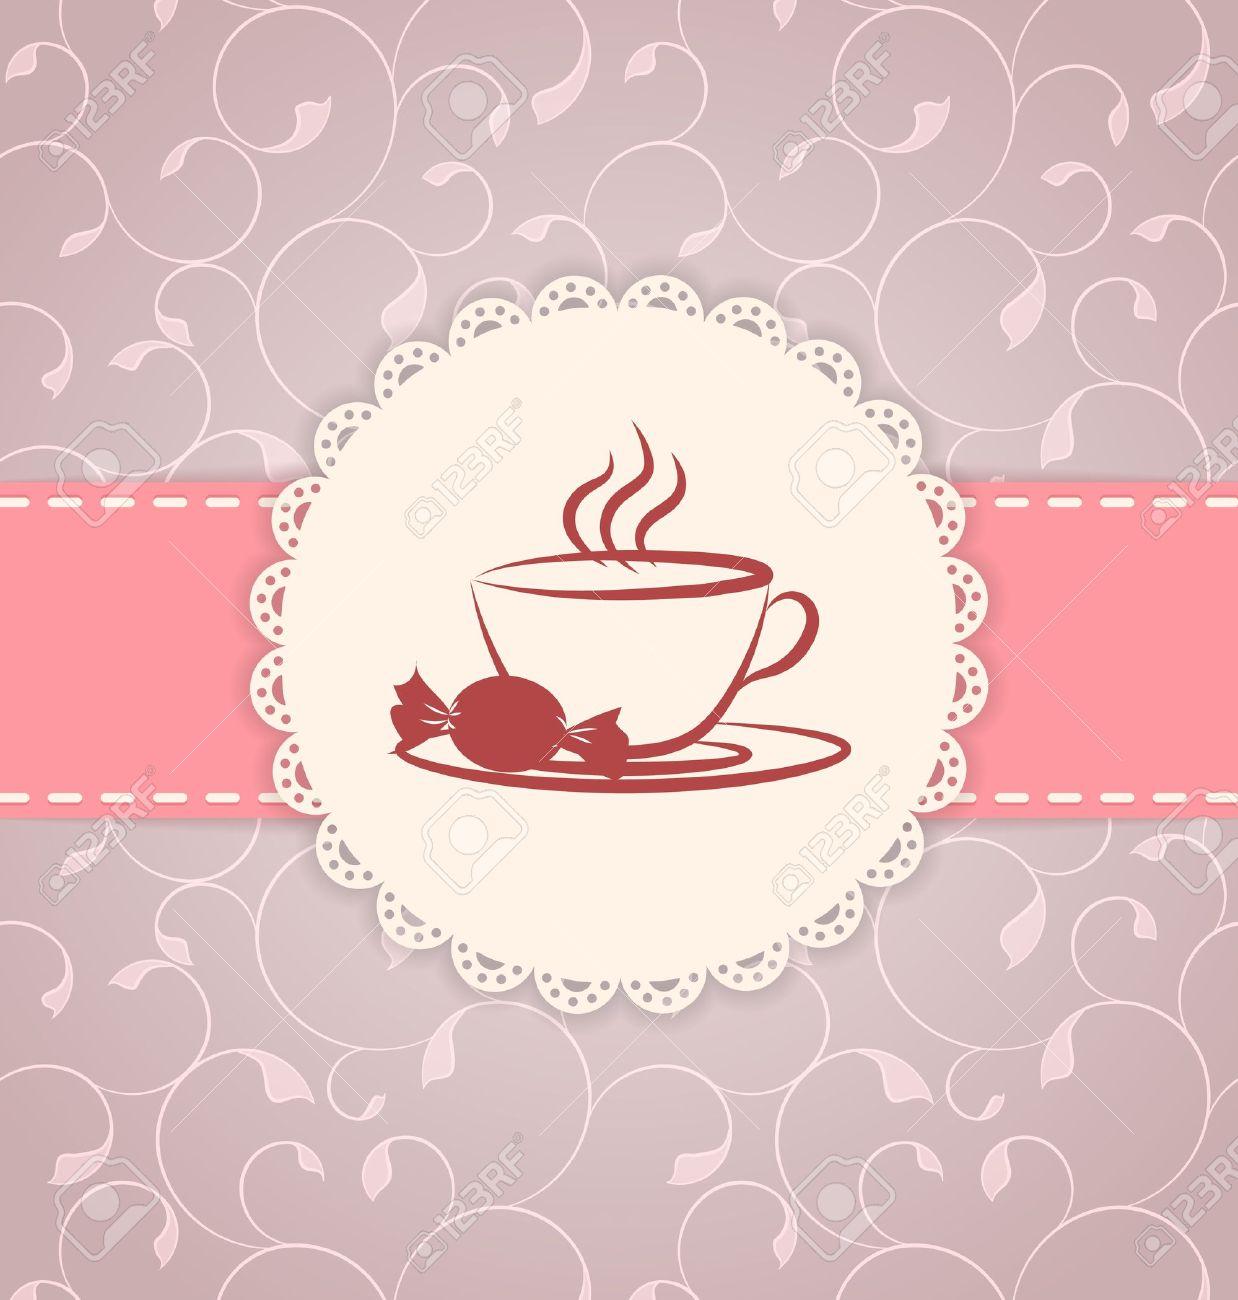 Tea party background royalty free stock photo image 28839215 - Tea Party Background Tea Party Vintage Applique